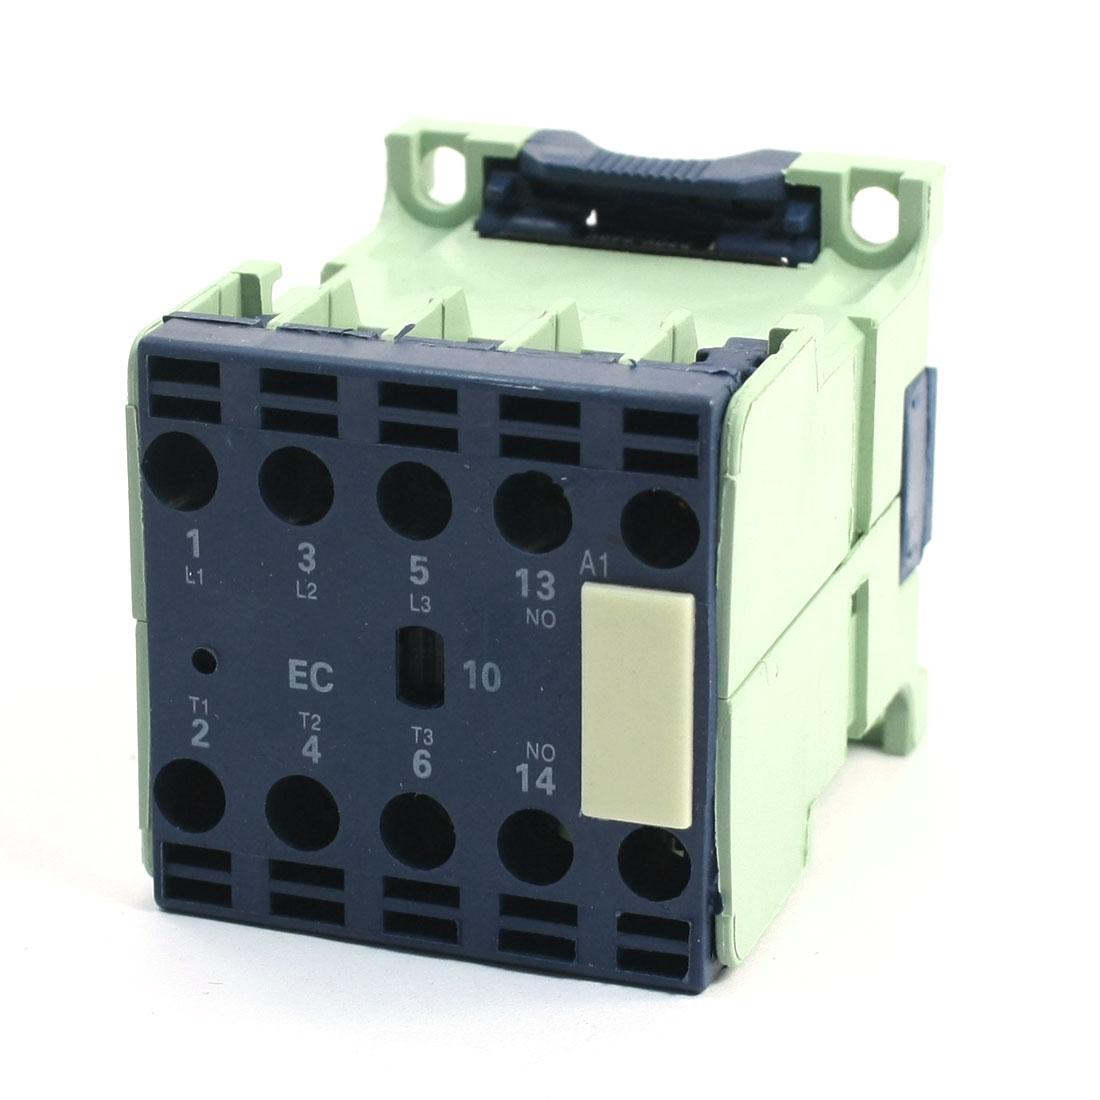 220-240V 50/60Hz Coil 3P + 1NO DIN Rail Mounted AC Contactor CJX2-0610E